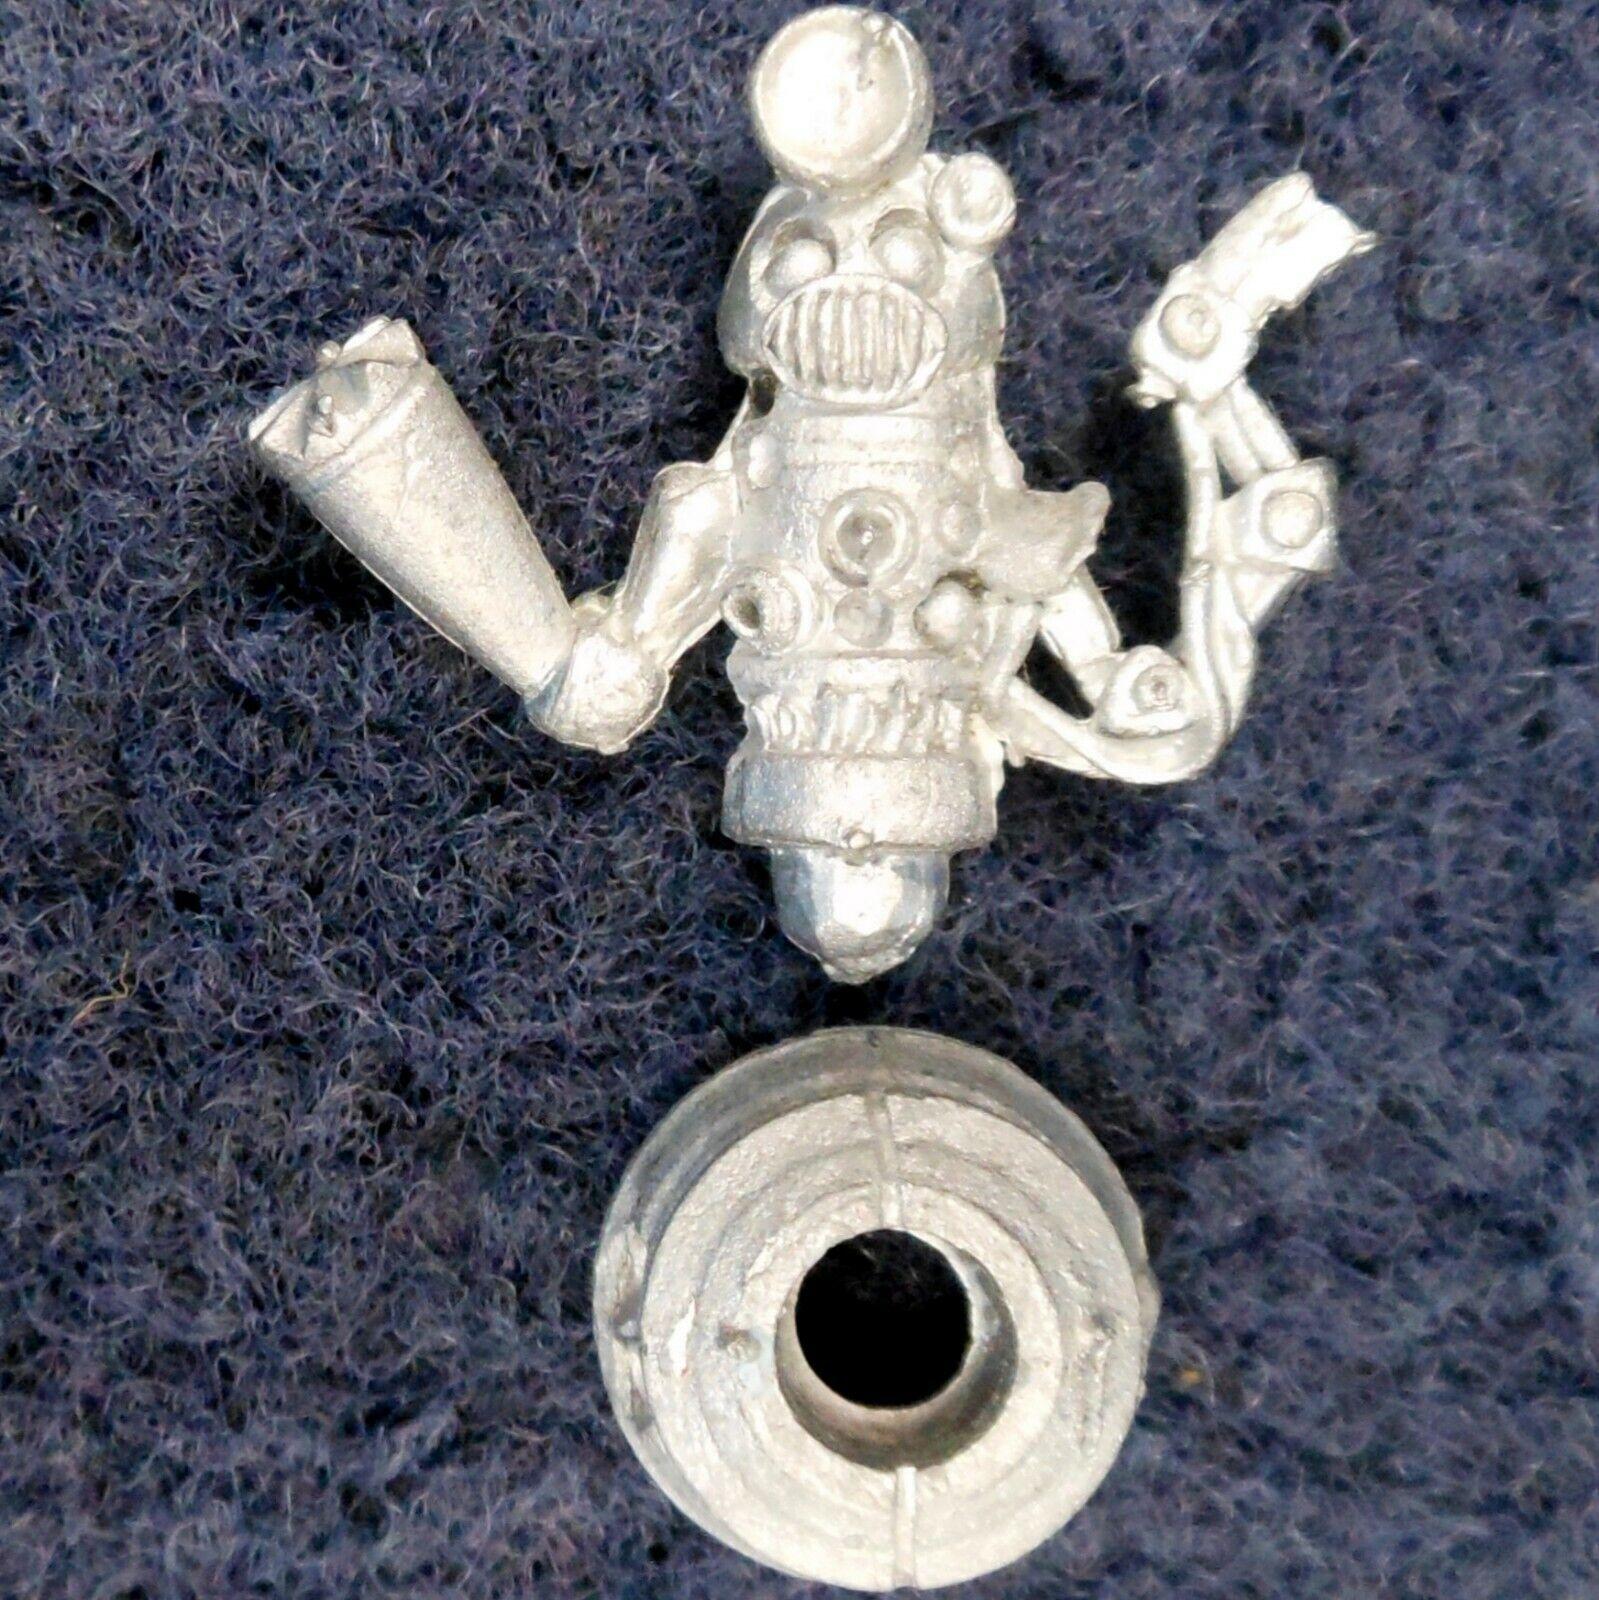 1985 PARA3 Paranoia Docbot H Games Workshop Bot Droid Robot Troubleshooter SciFi